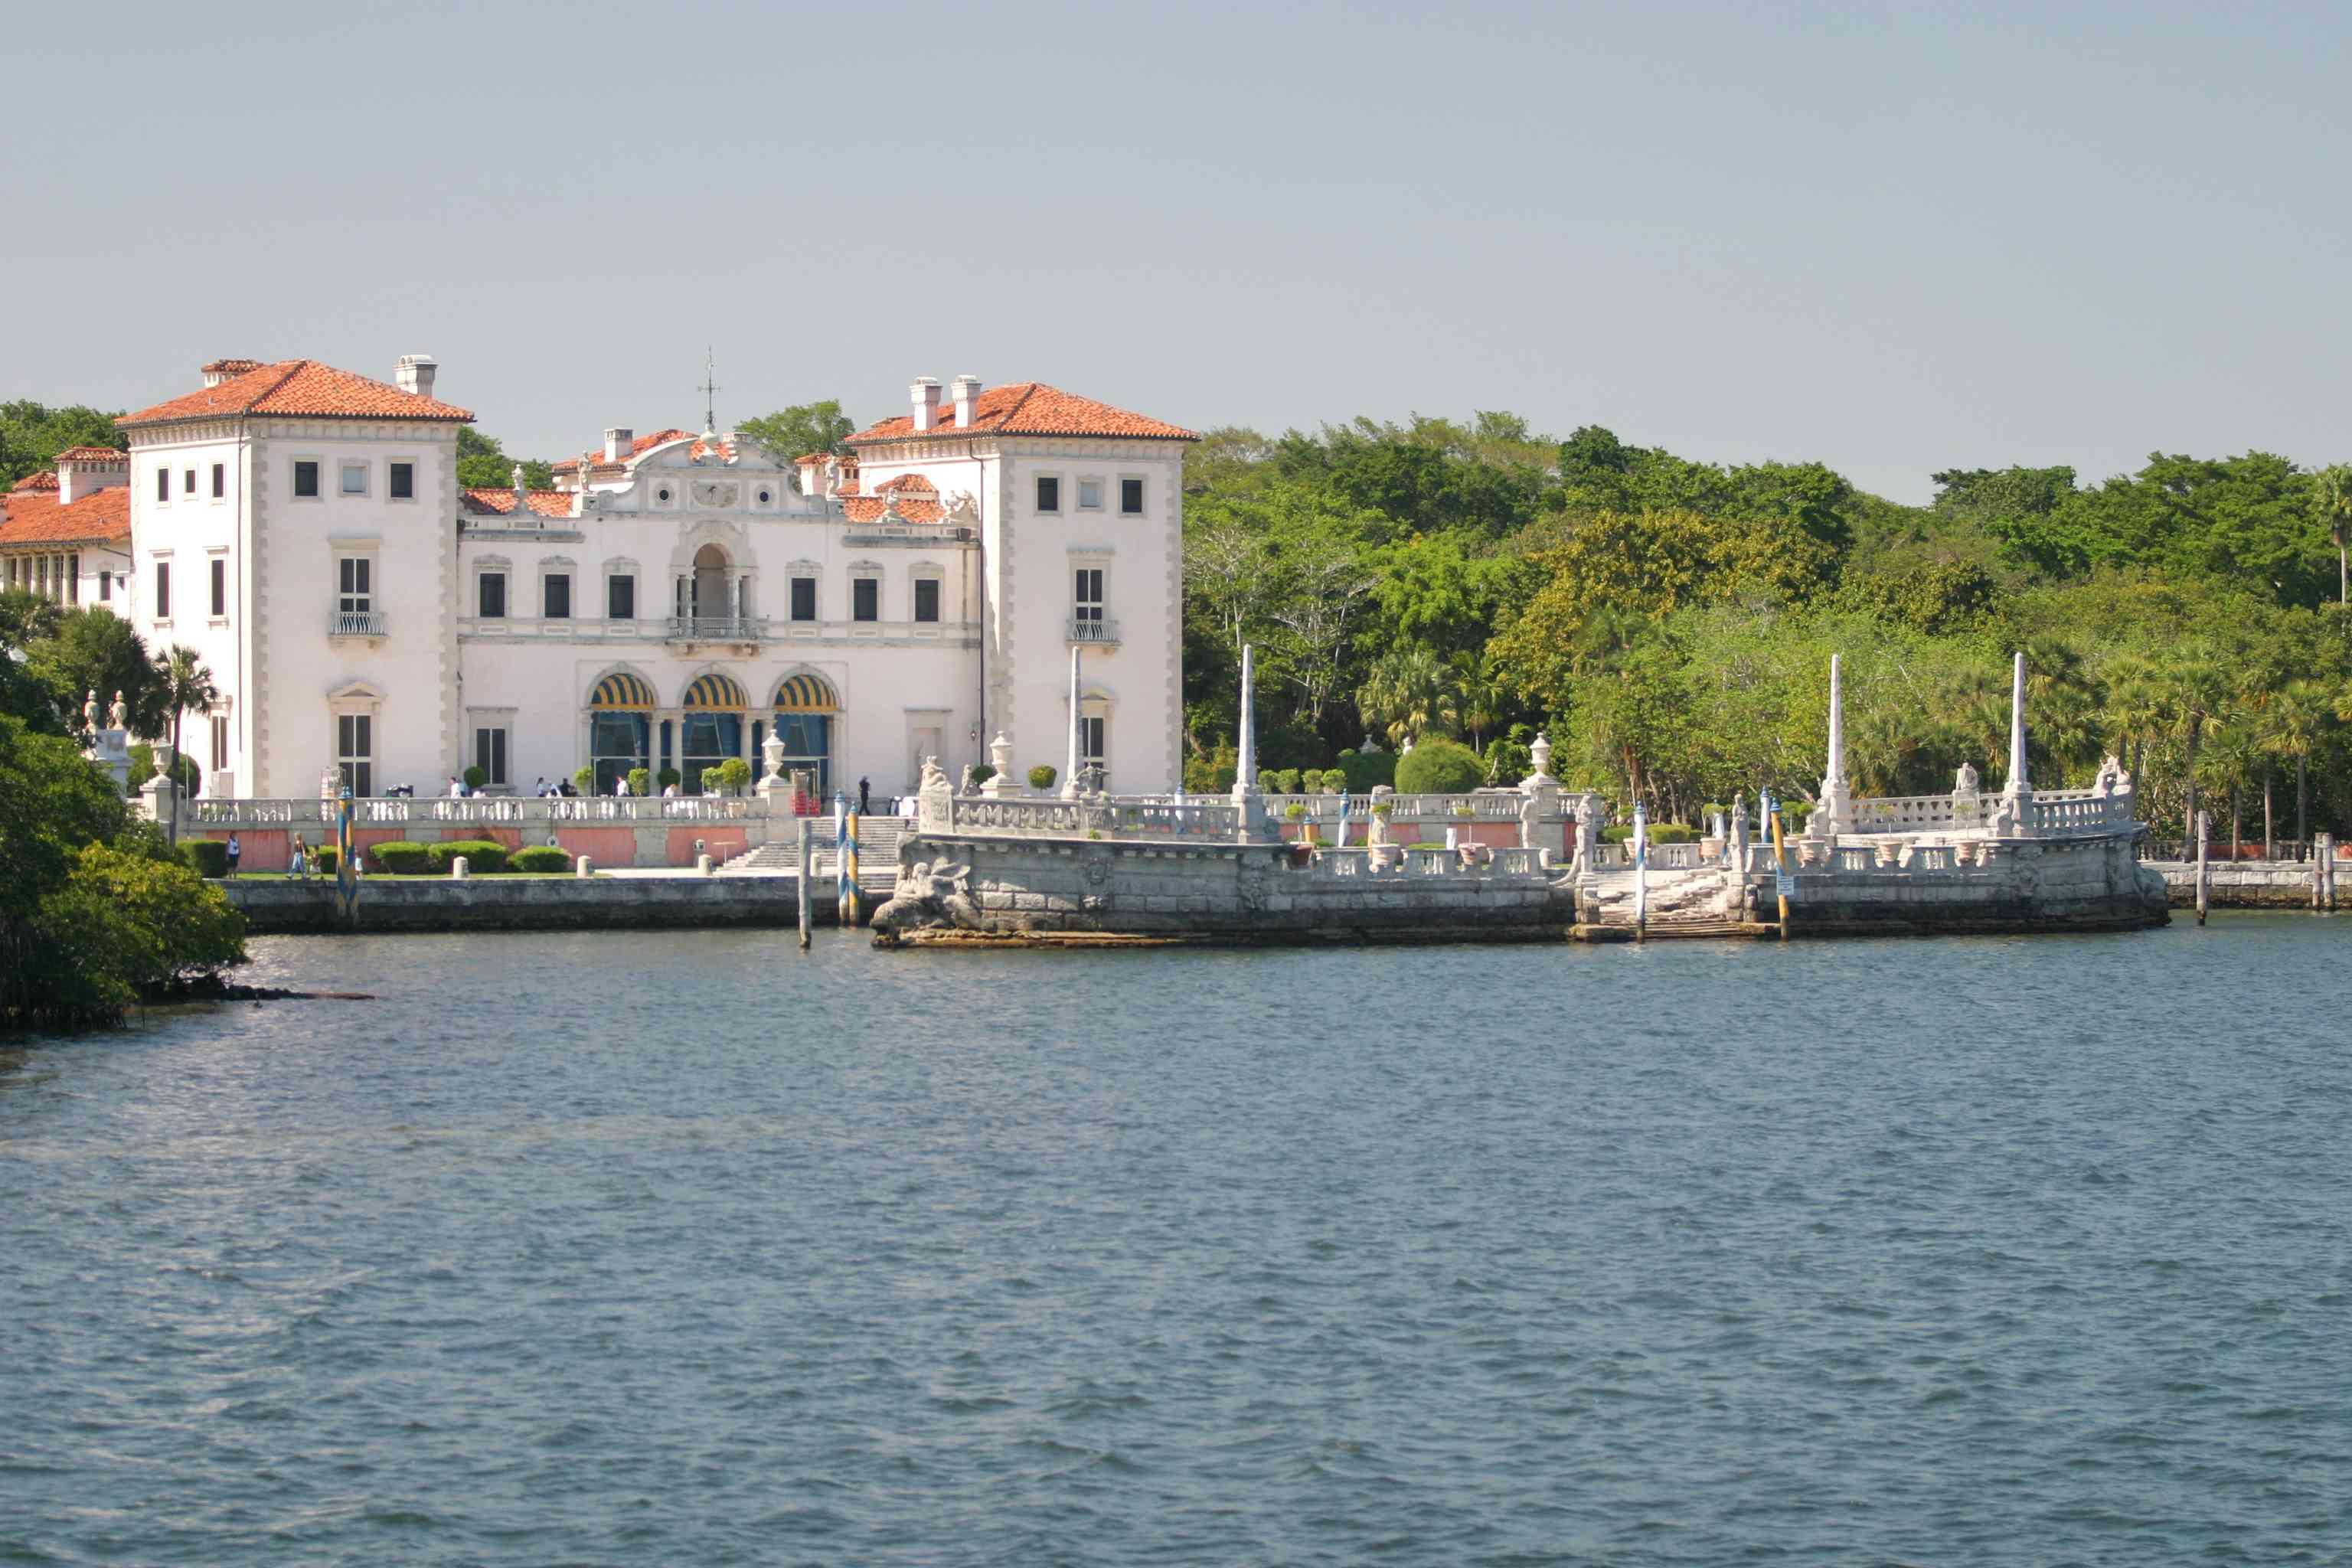 Vizcaya Palace